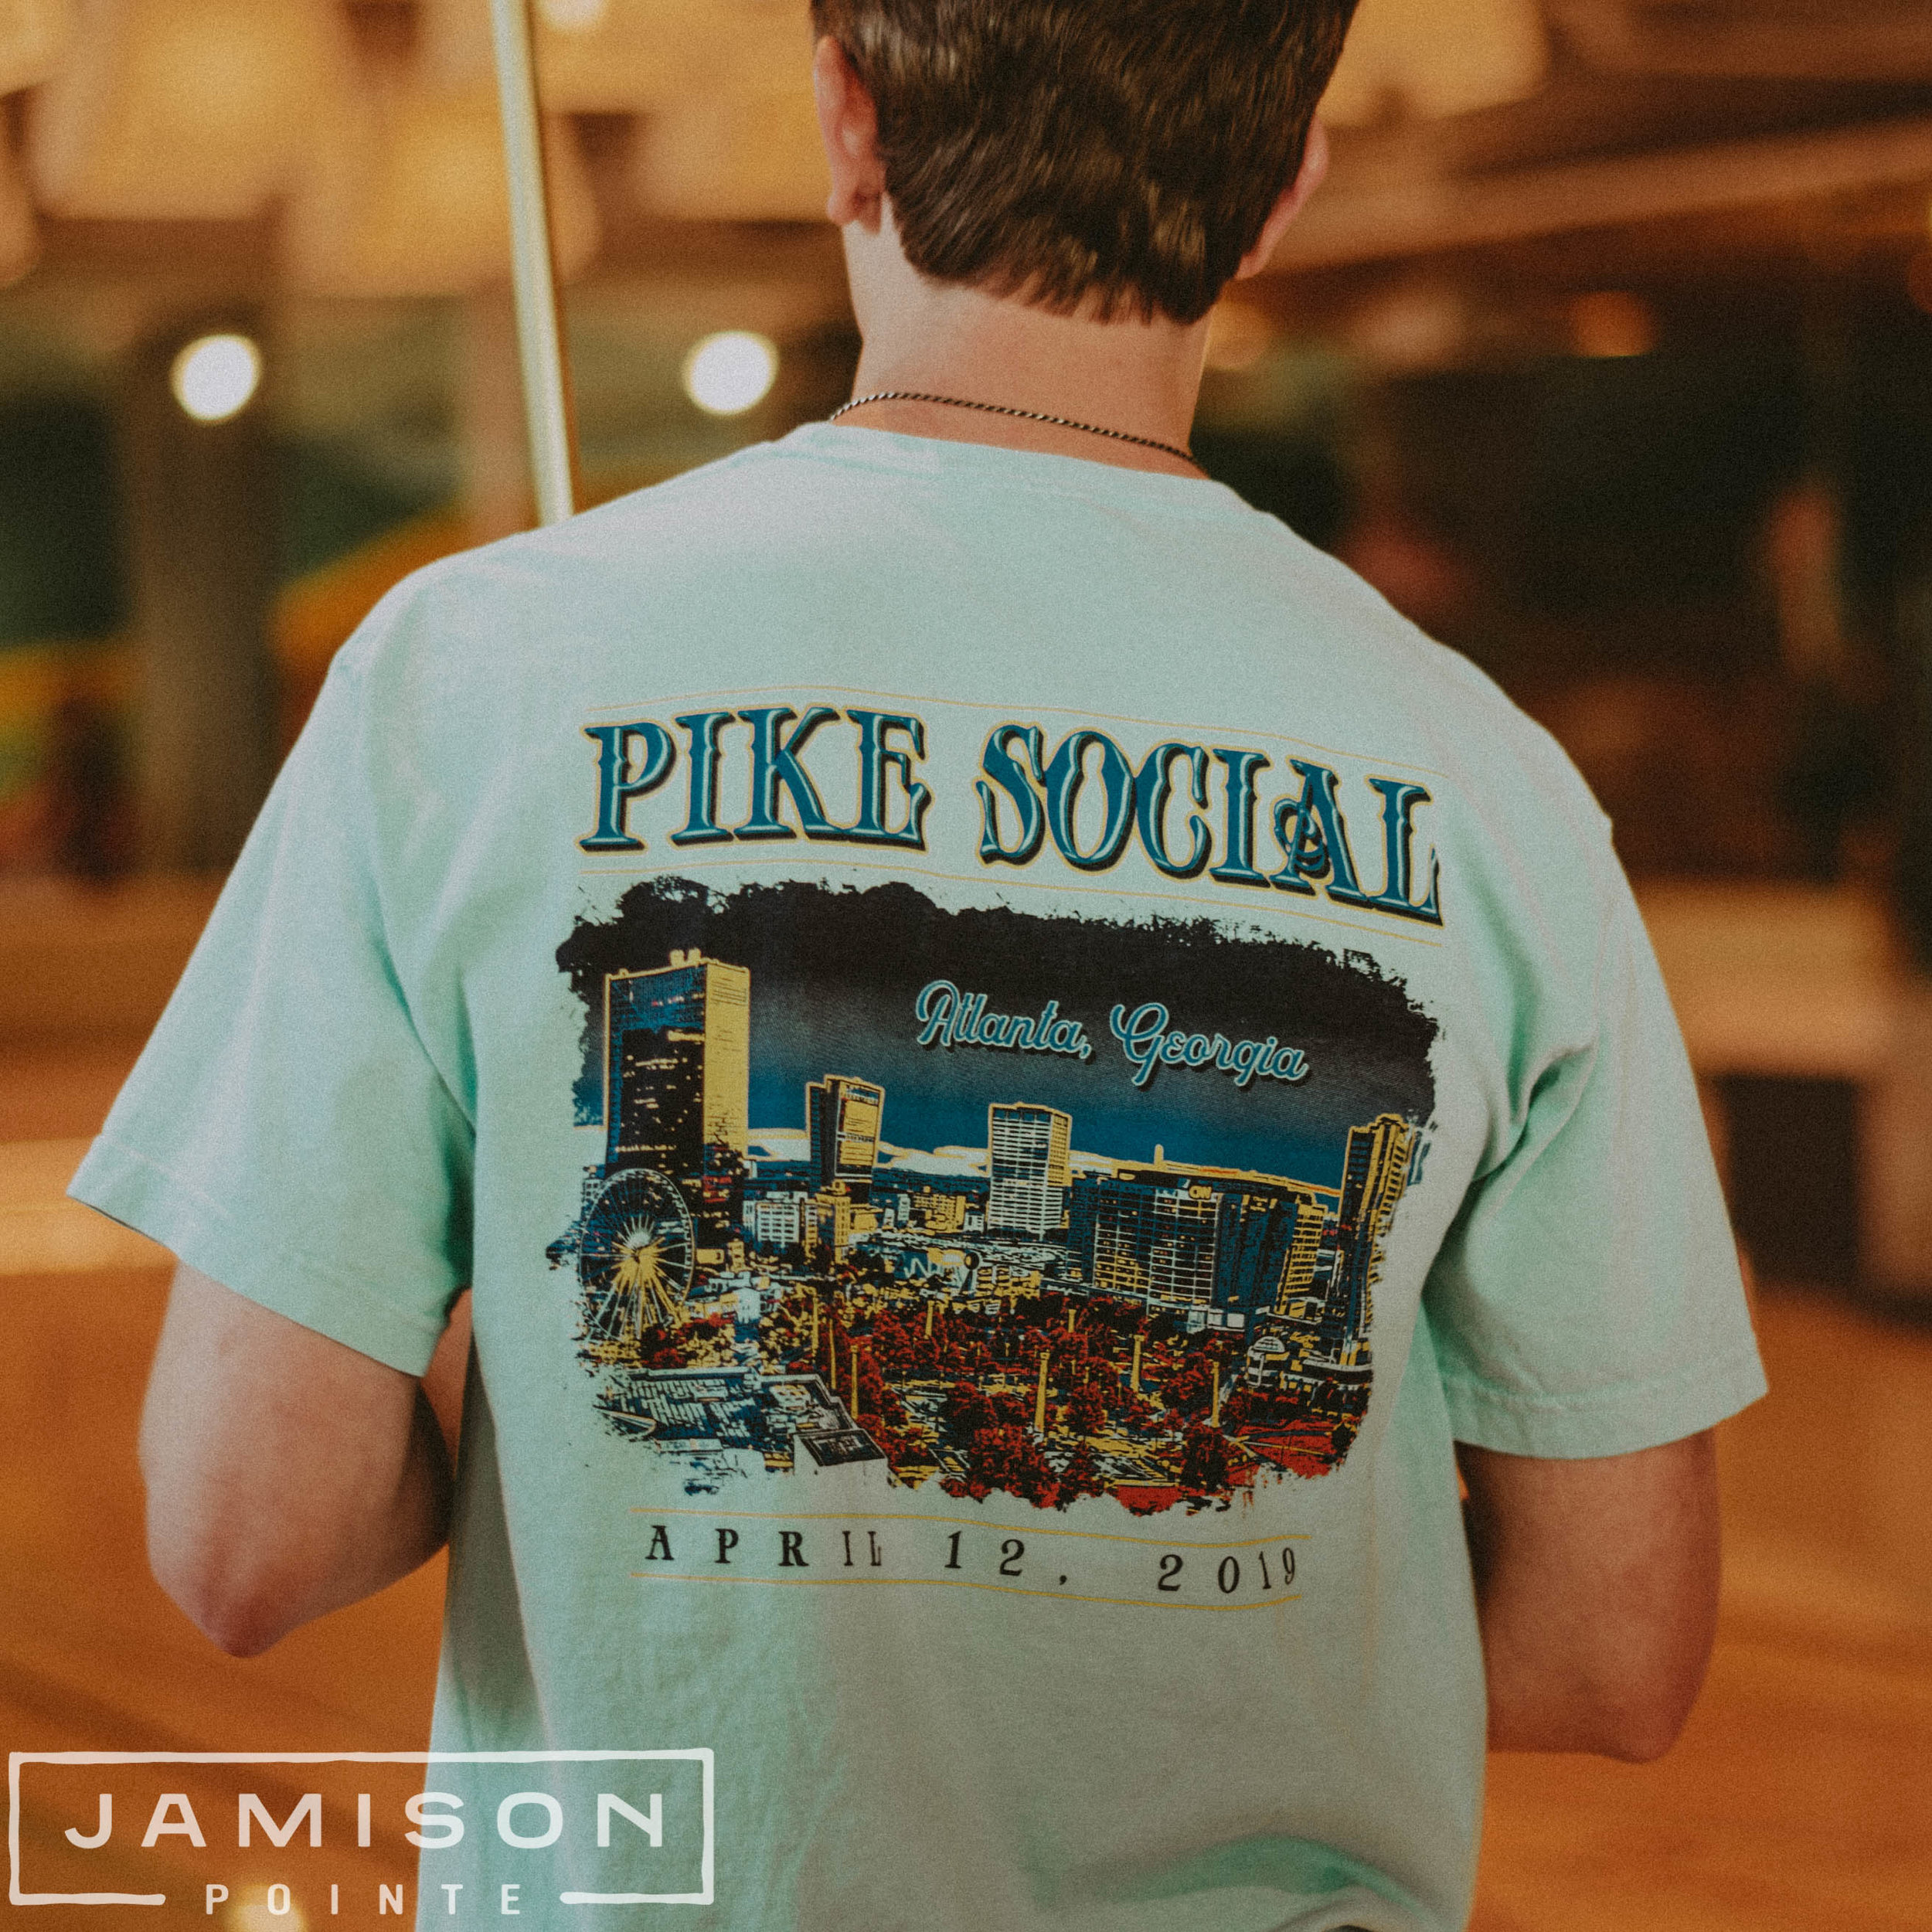 Pike Social Tee